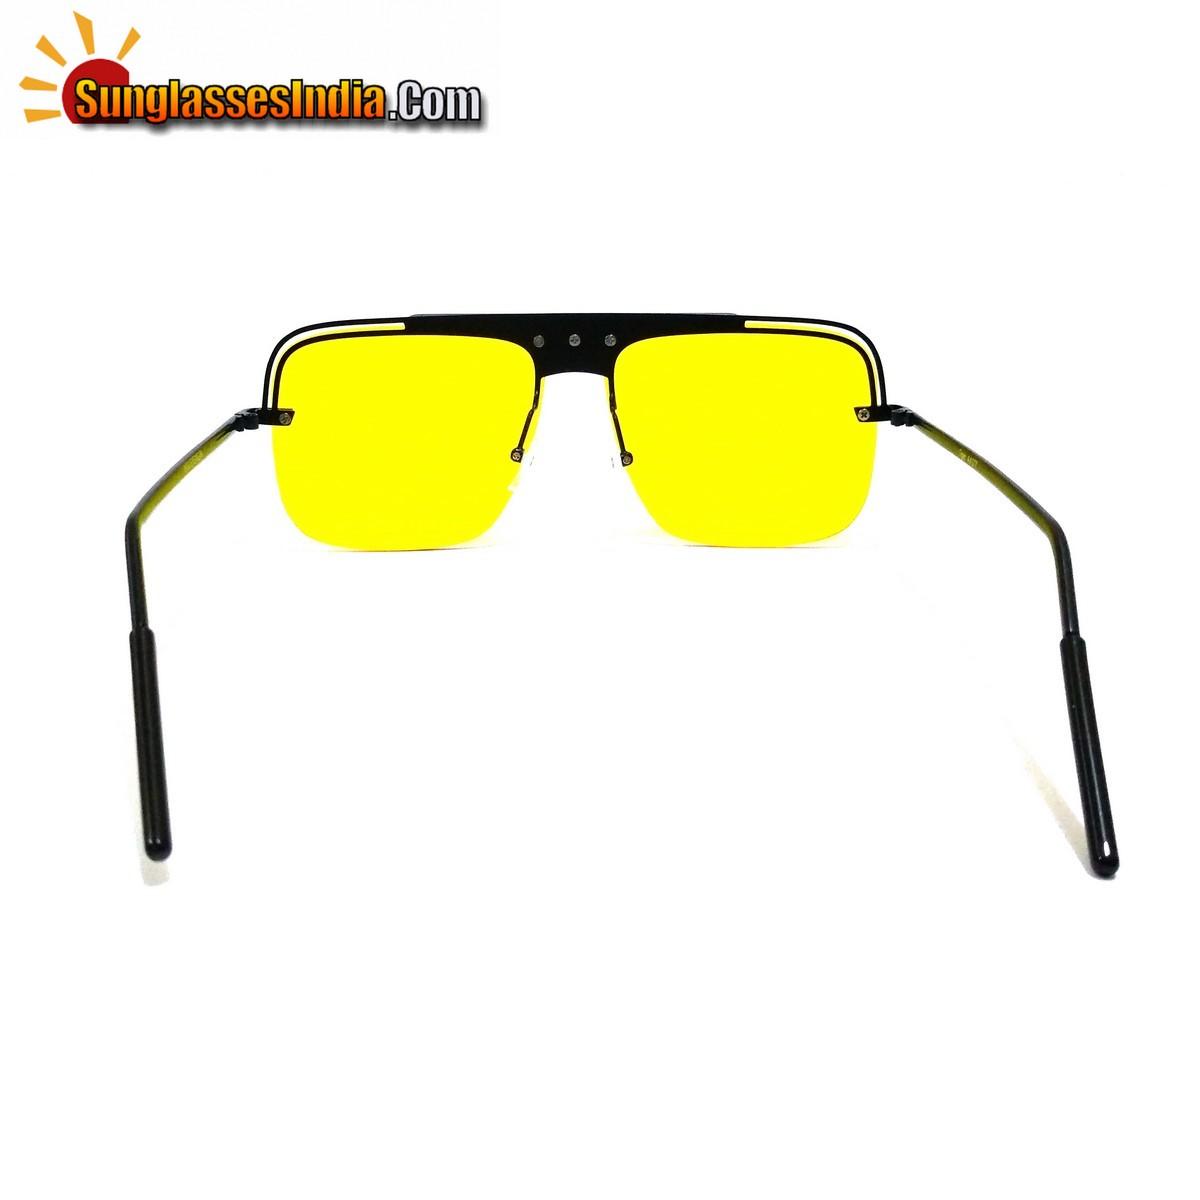 Badshaah Style Night Driving Sunglasses Trendy Club Sunglasses Tik Tok Video Goggles